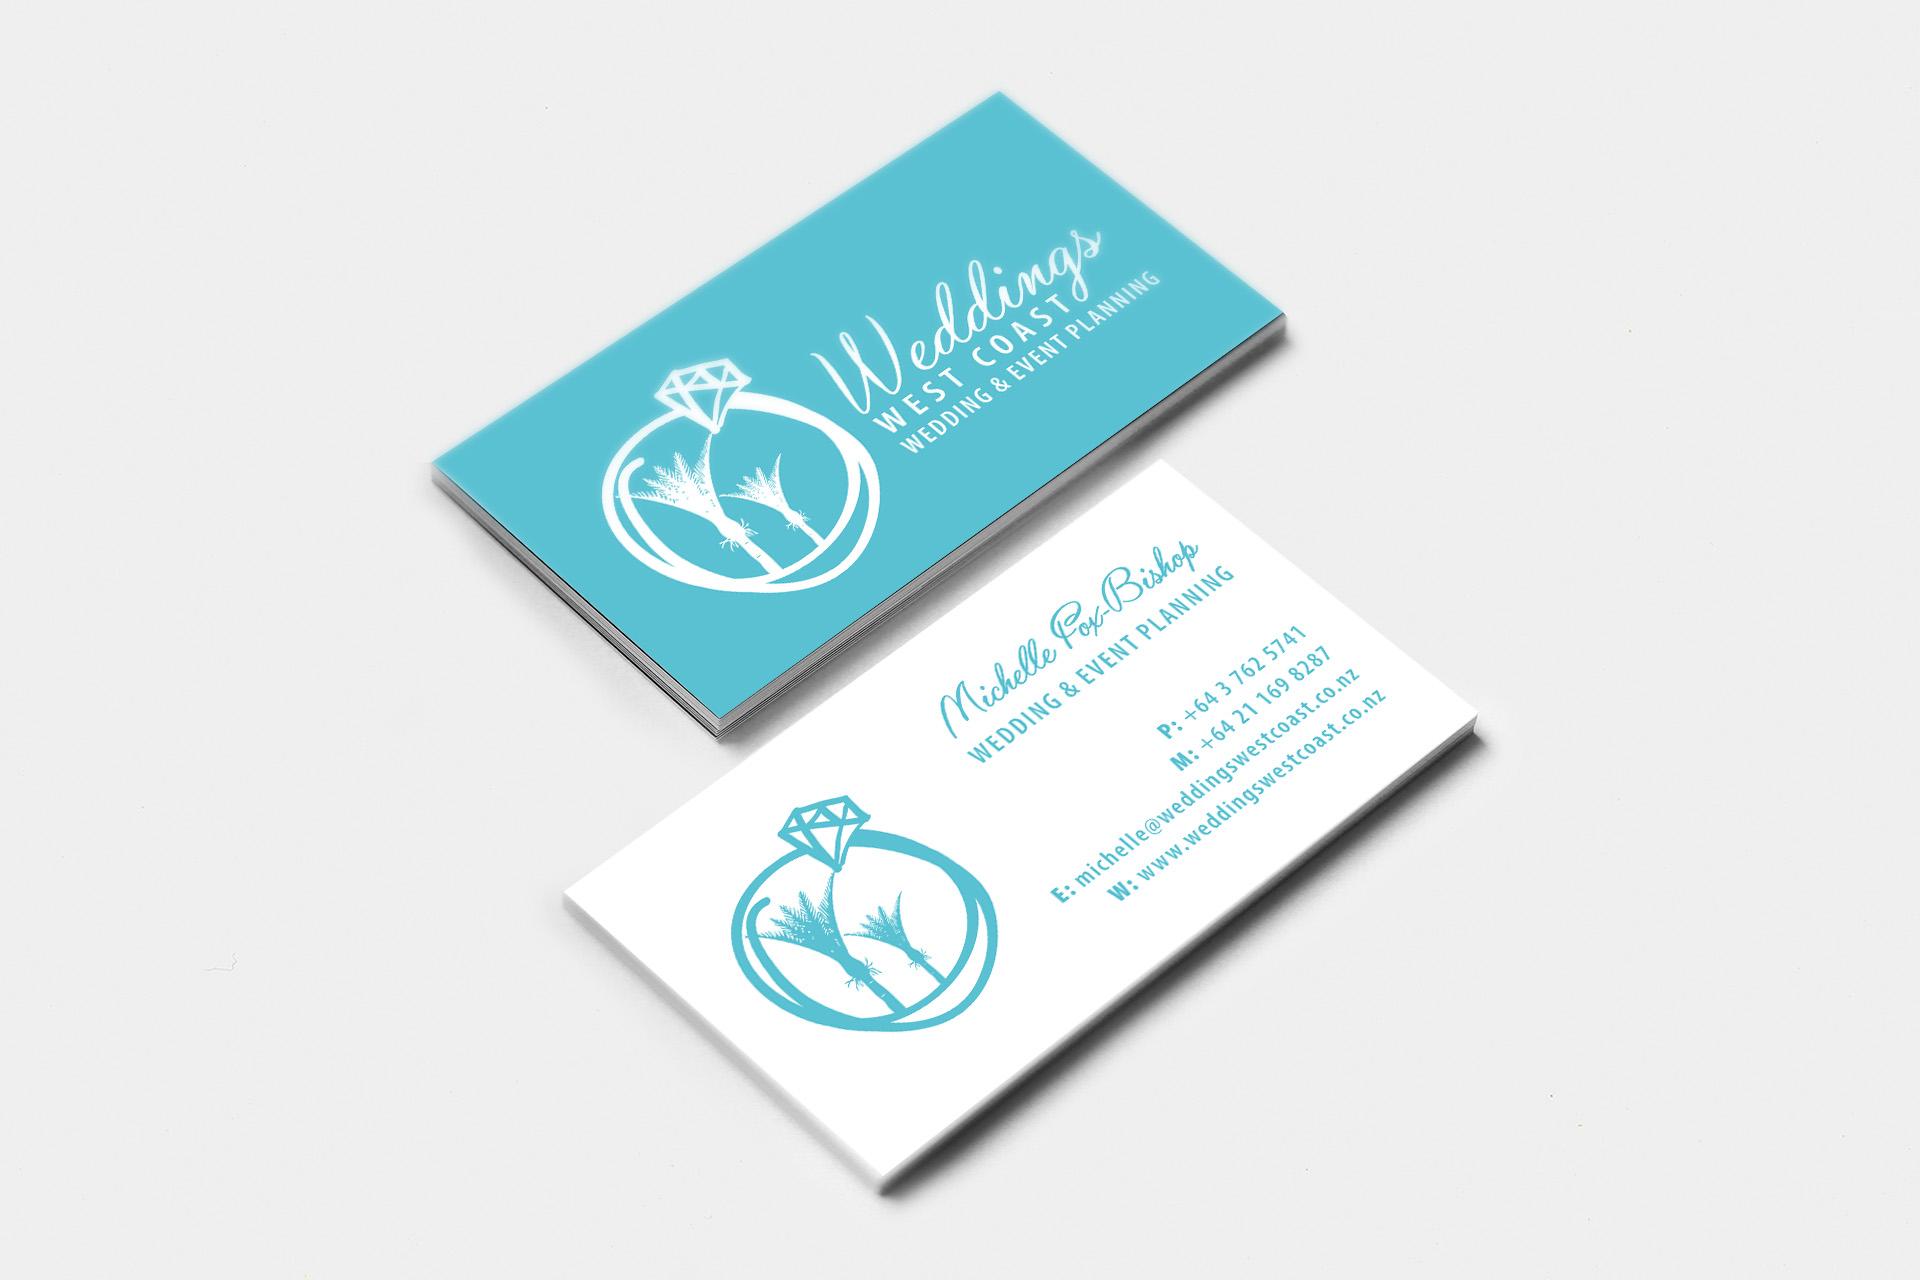 Weddings West Coast Business Card Design